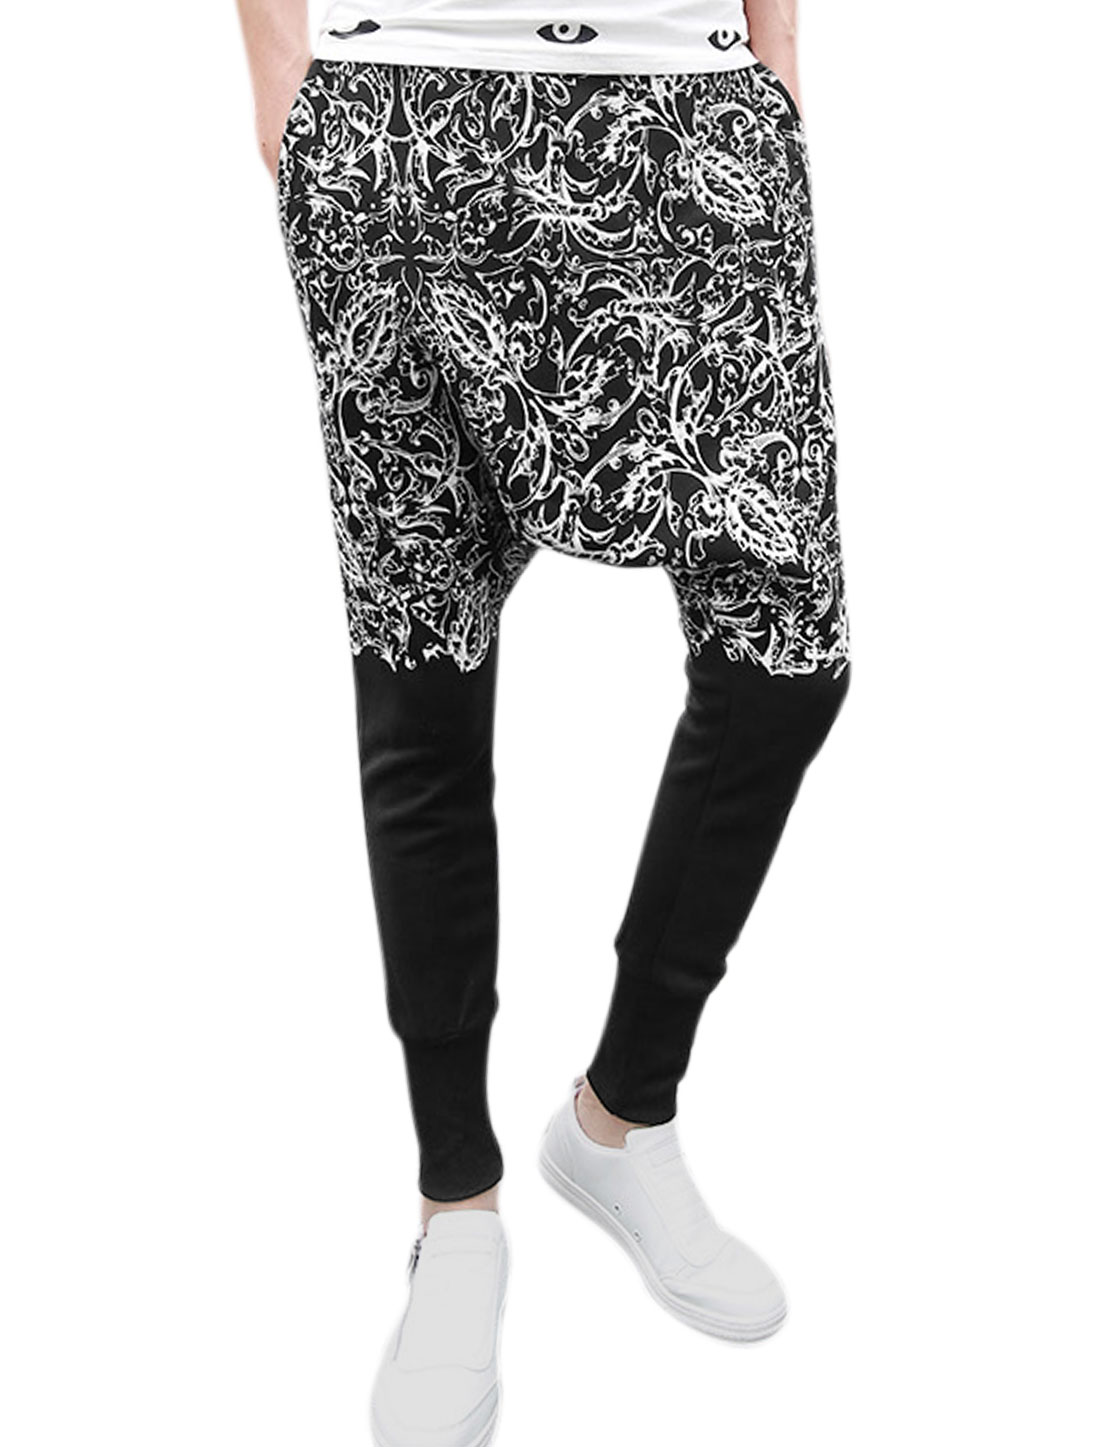 Men Elastic Waist Floral Prints Hip-hop Crotch Casual Harem Pants Black W30